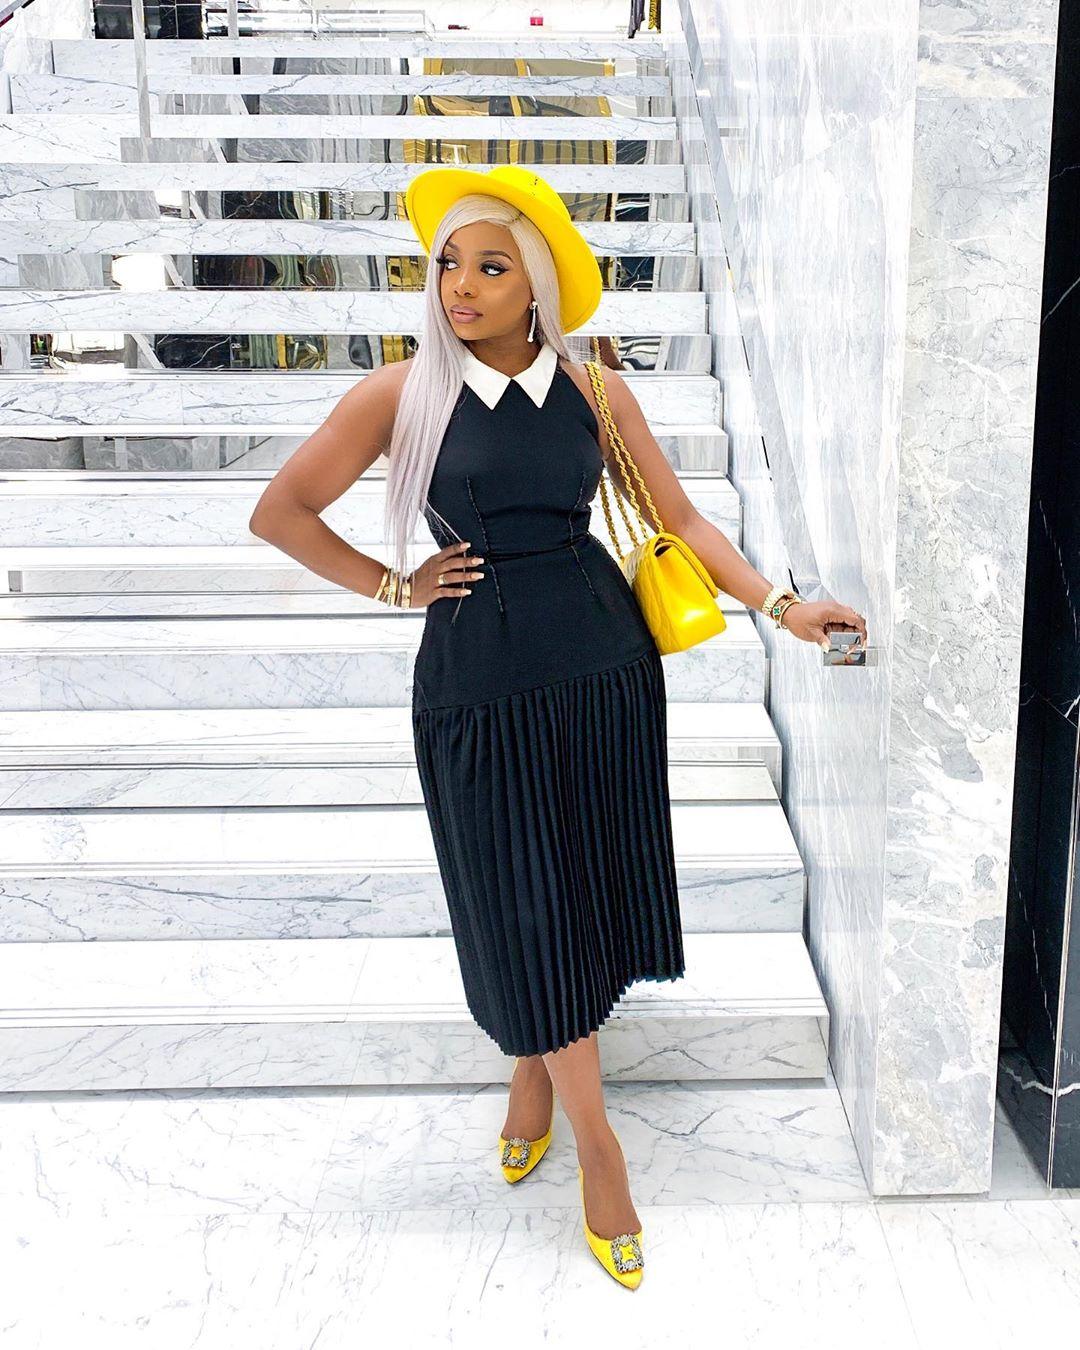 chioma-ikokwu-designer-good-hair-handbags-shoes-goodhairltd